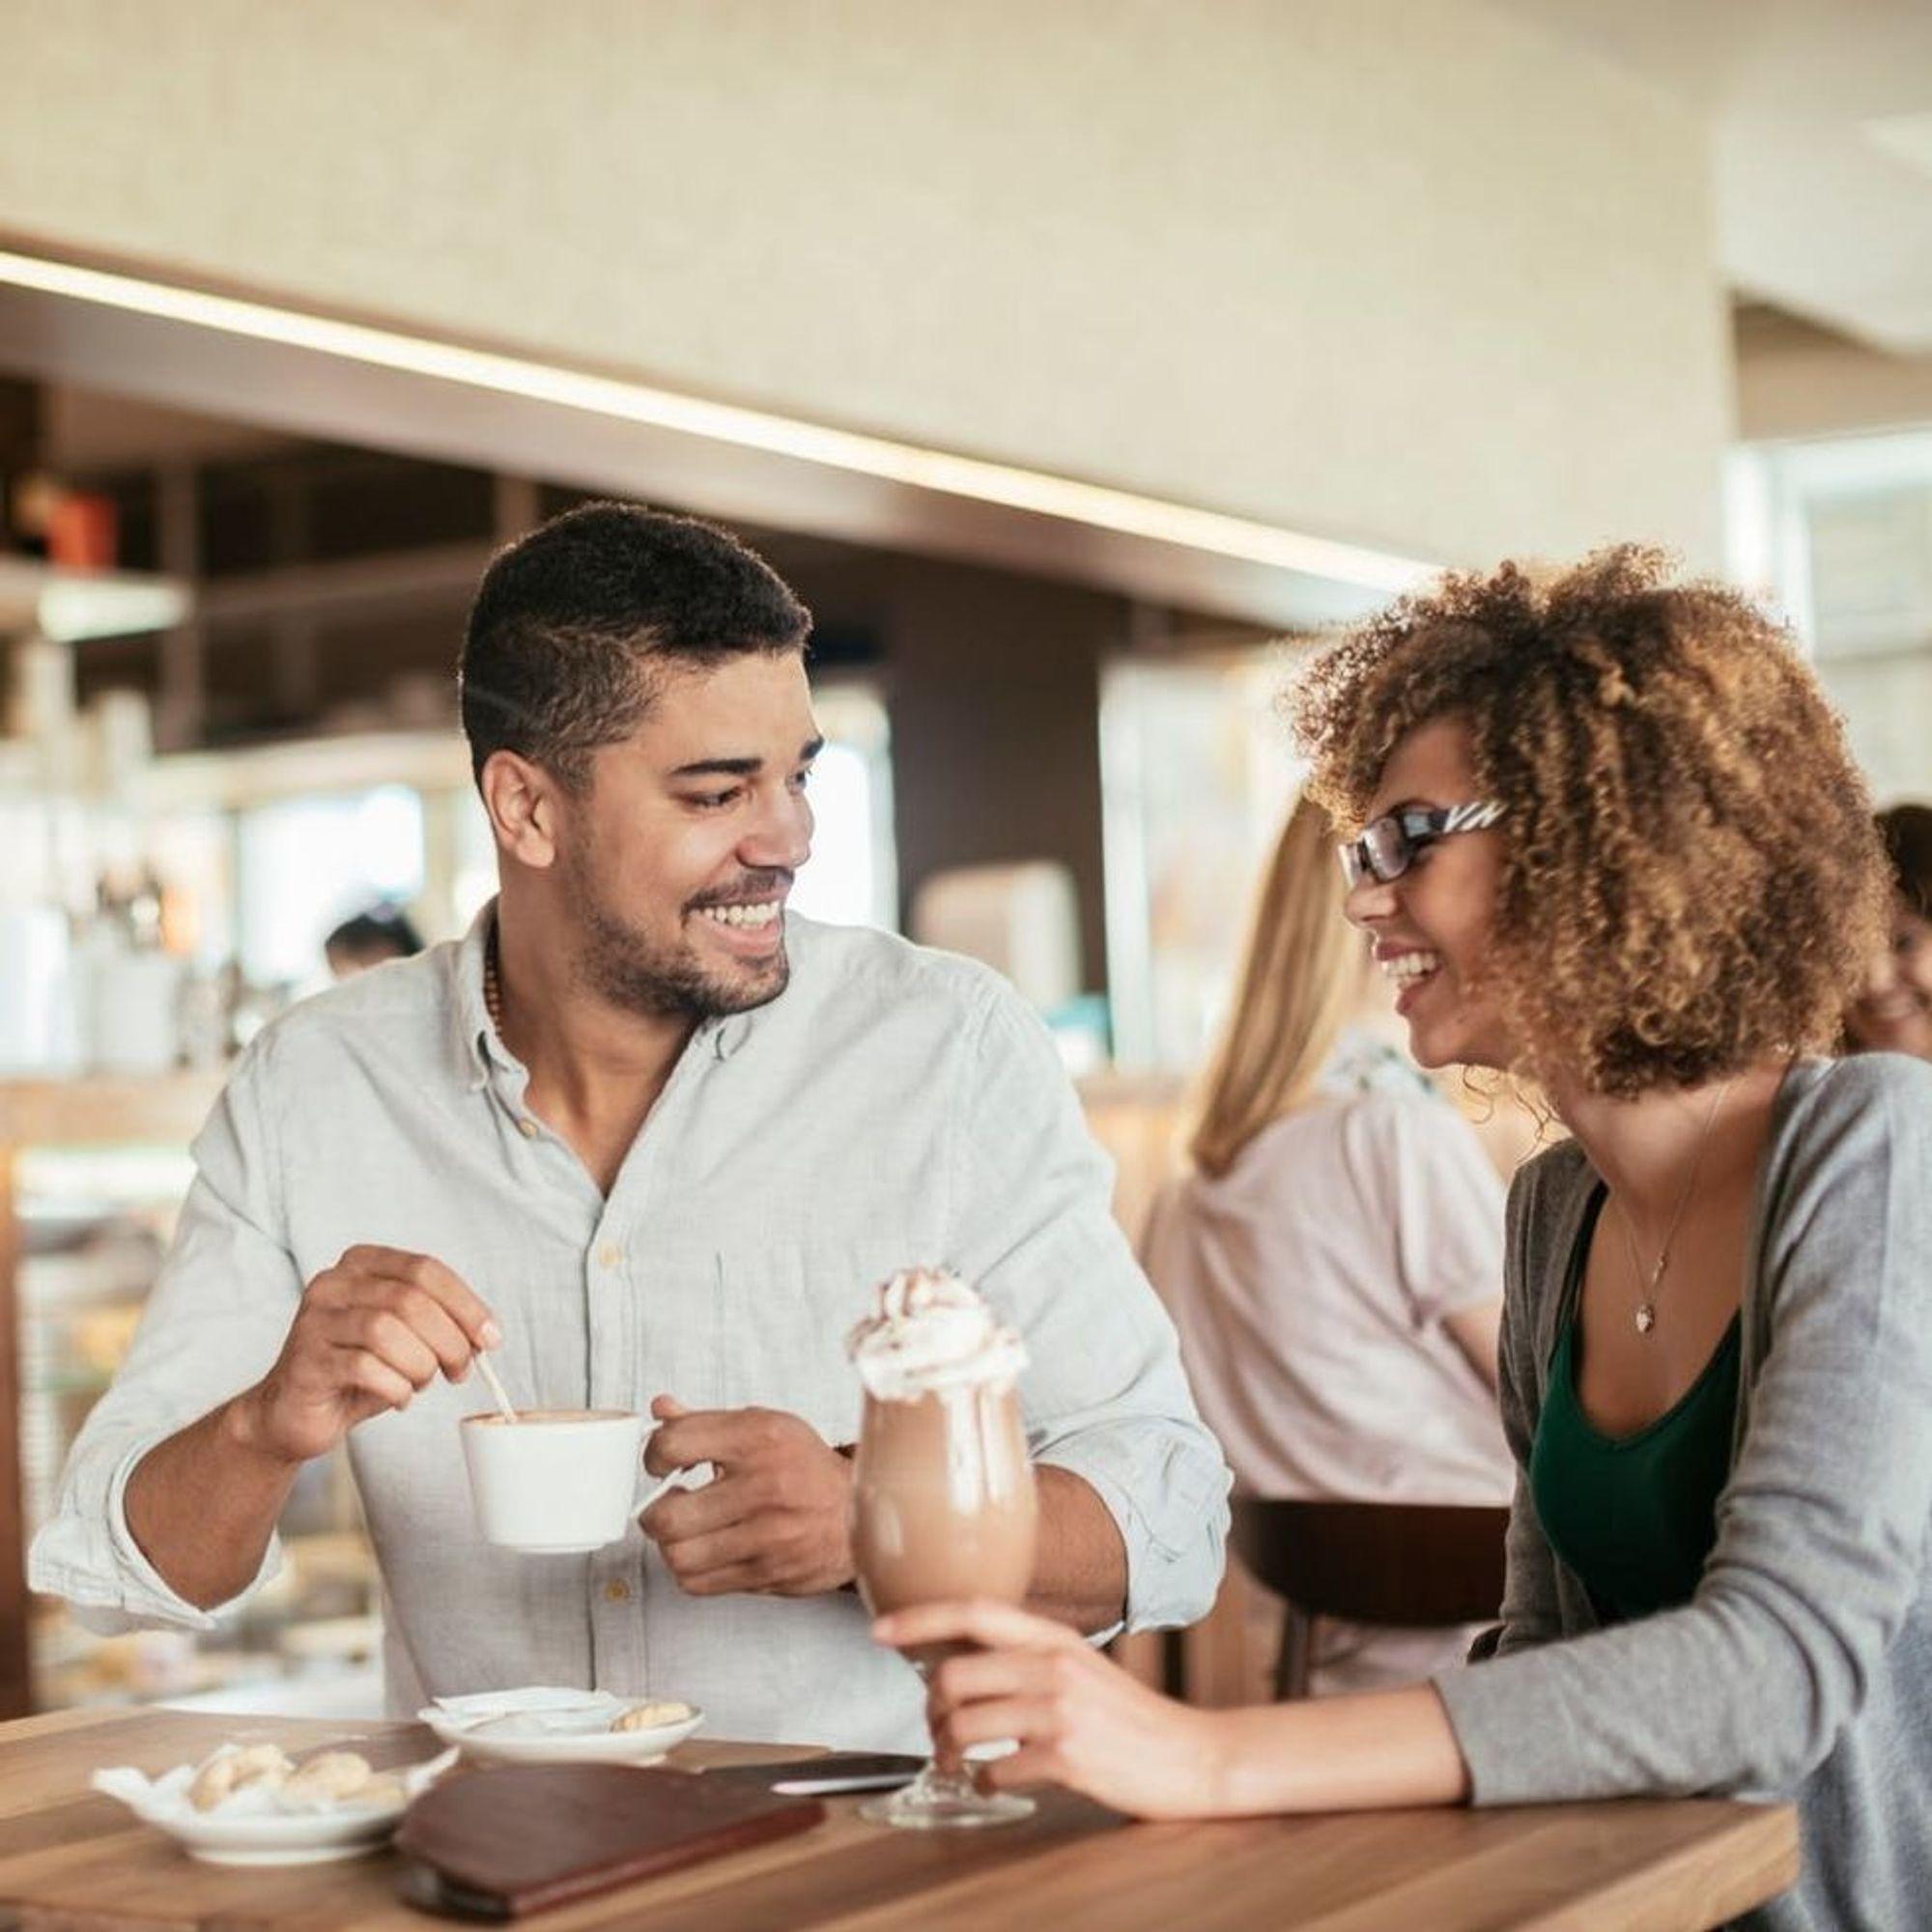 5 Conversation Tips to Make a First Date Less Awkward